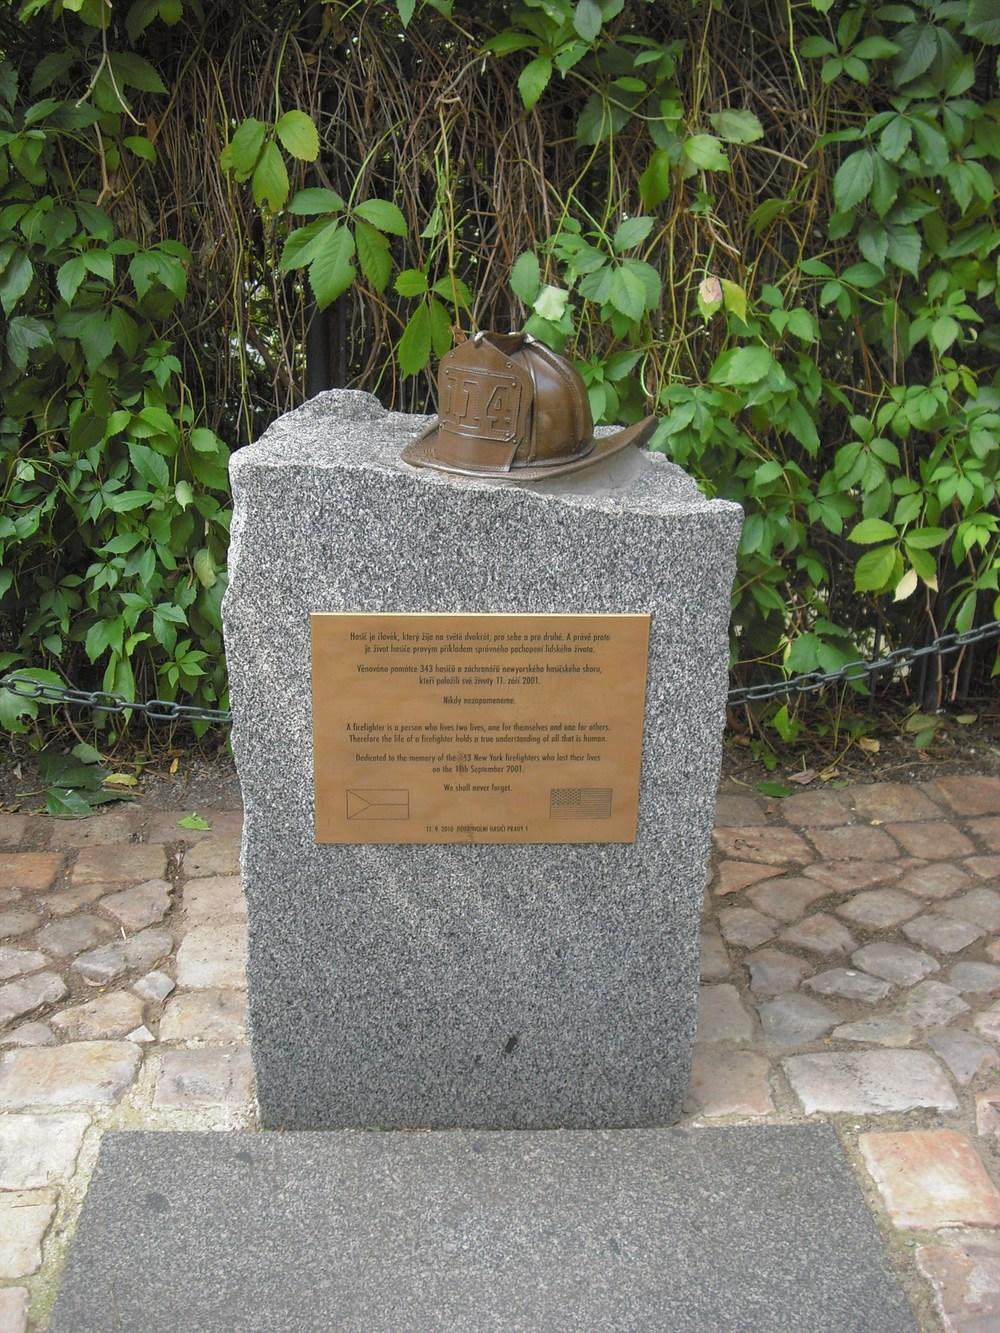 Memorials to First Responders